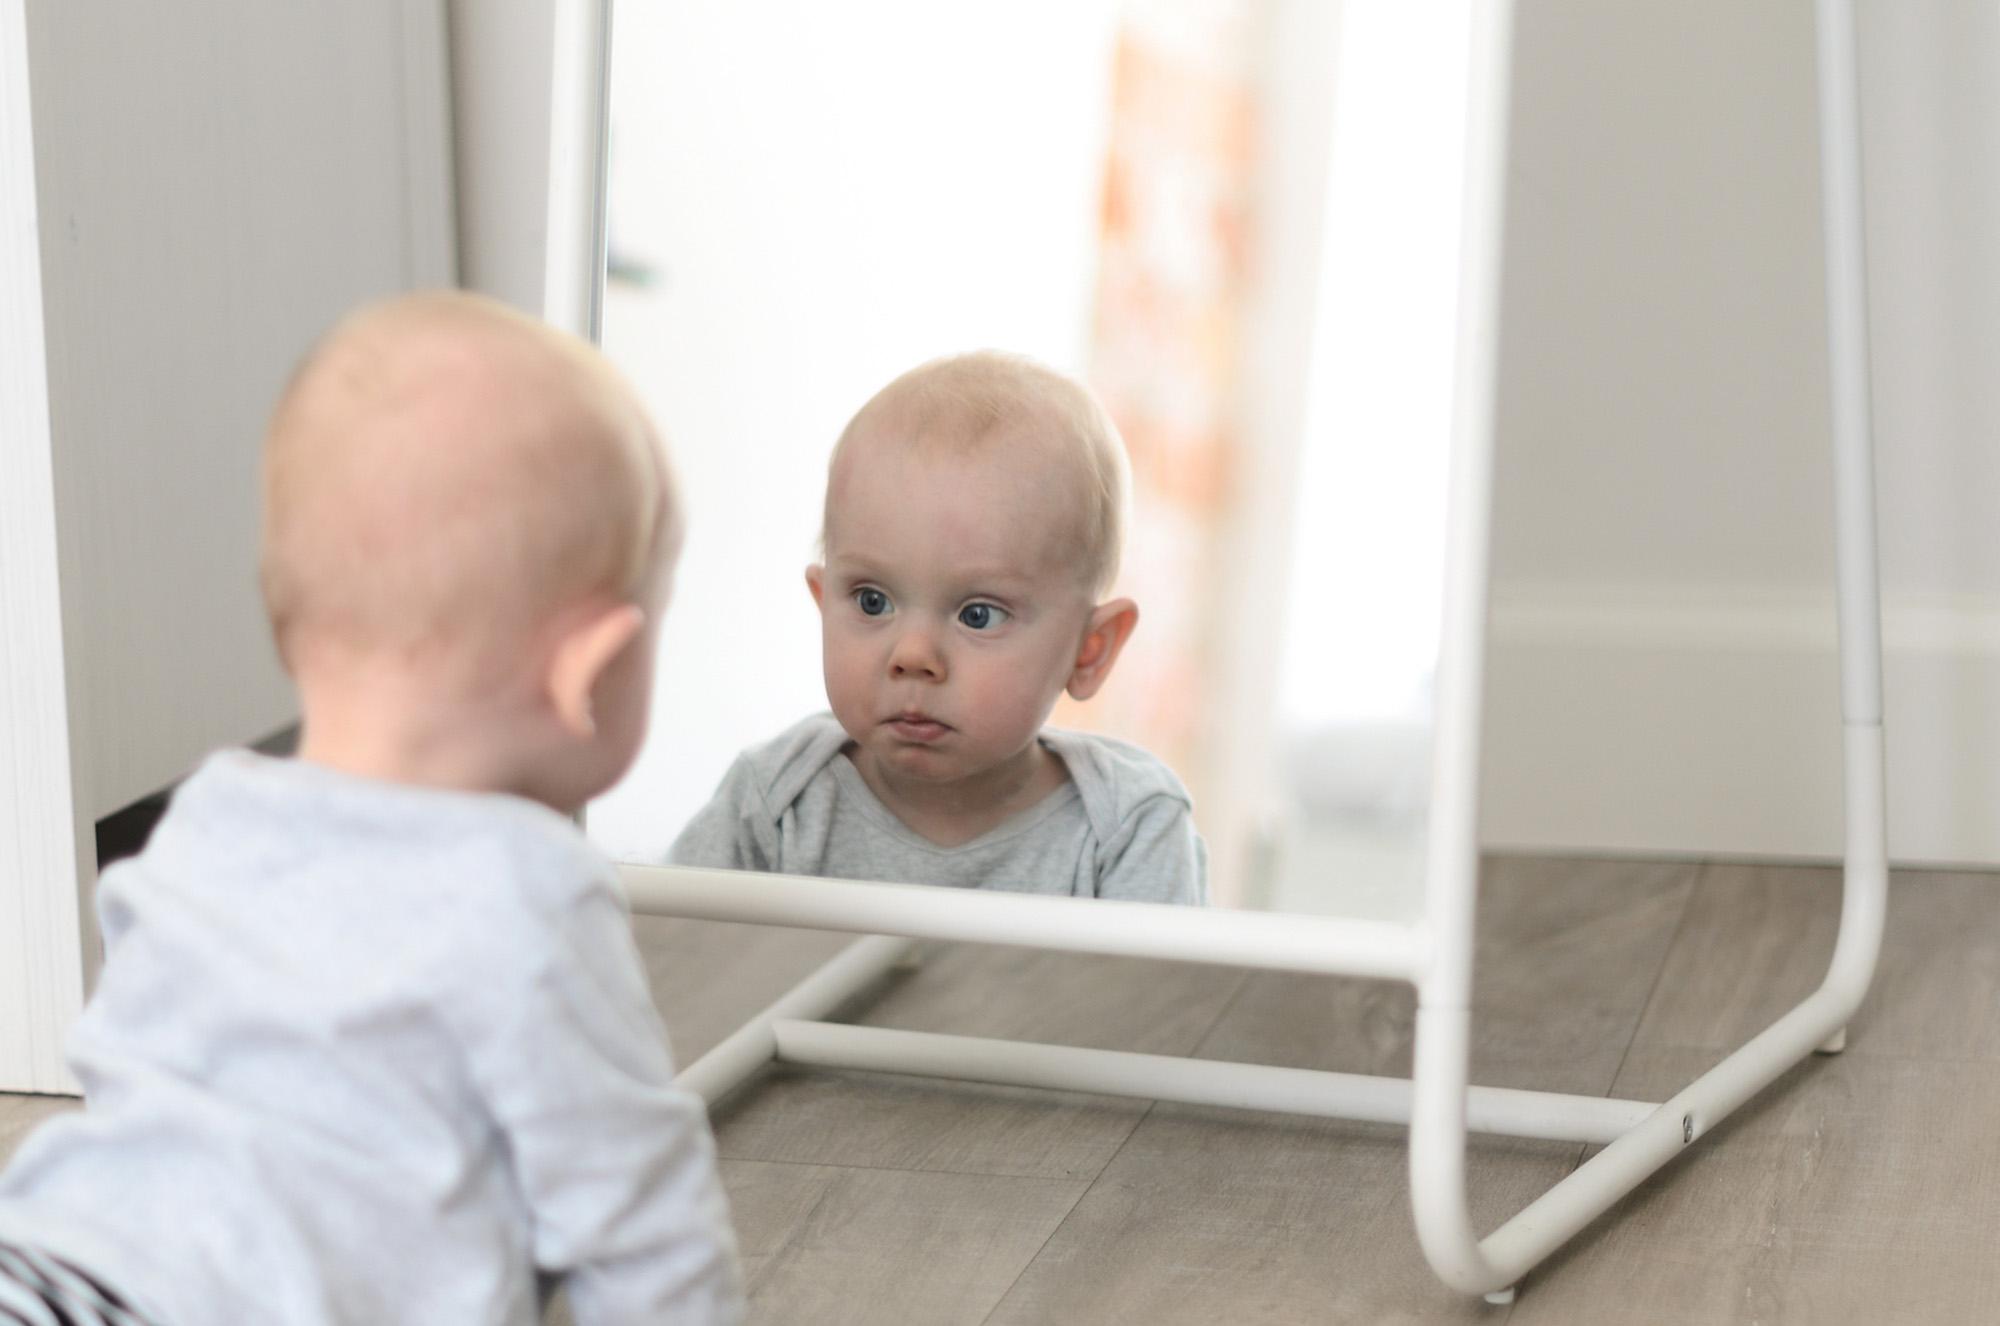 Fun cute baby seeing self in mirror-72 ppi